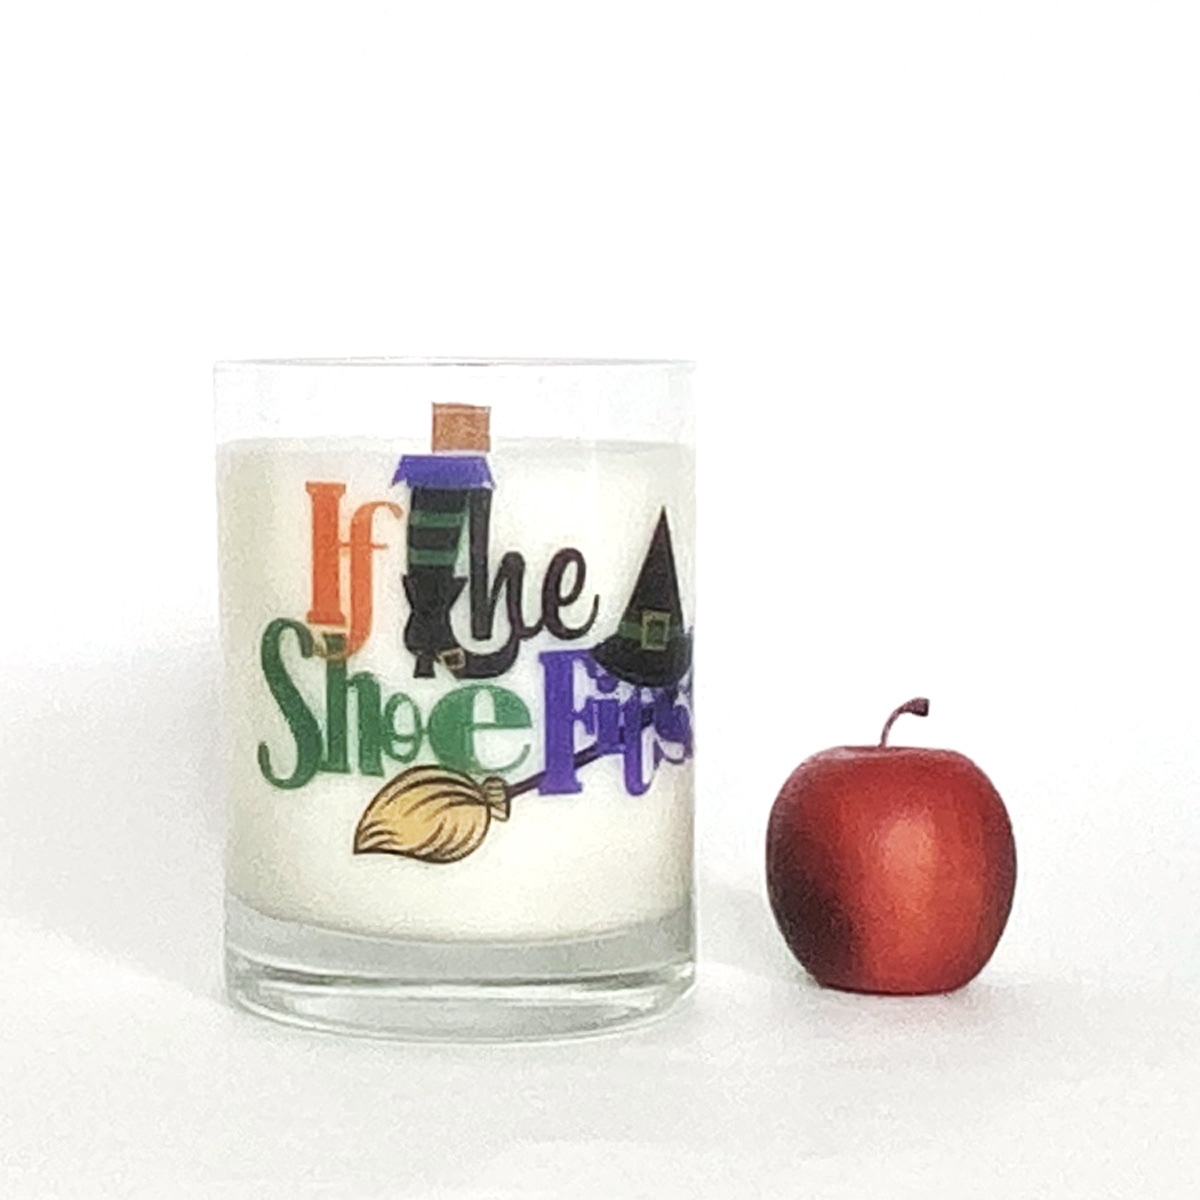 fresh apple 10